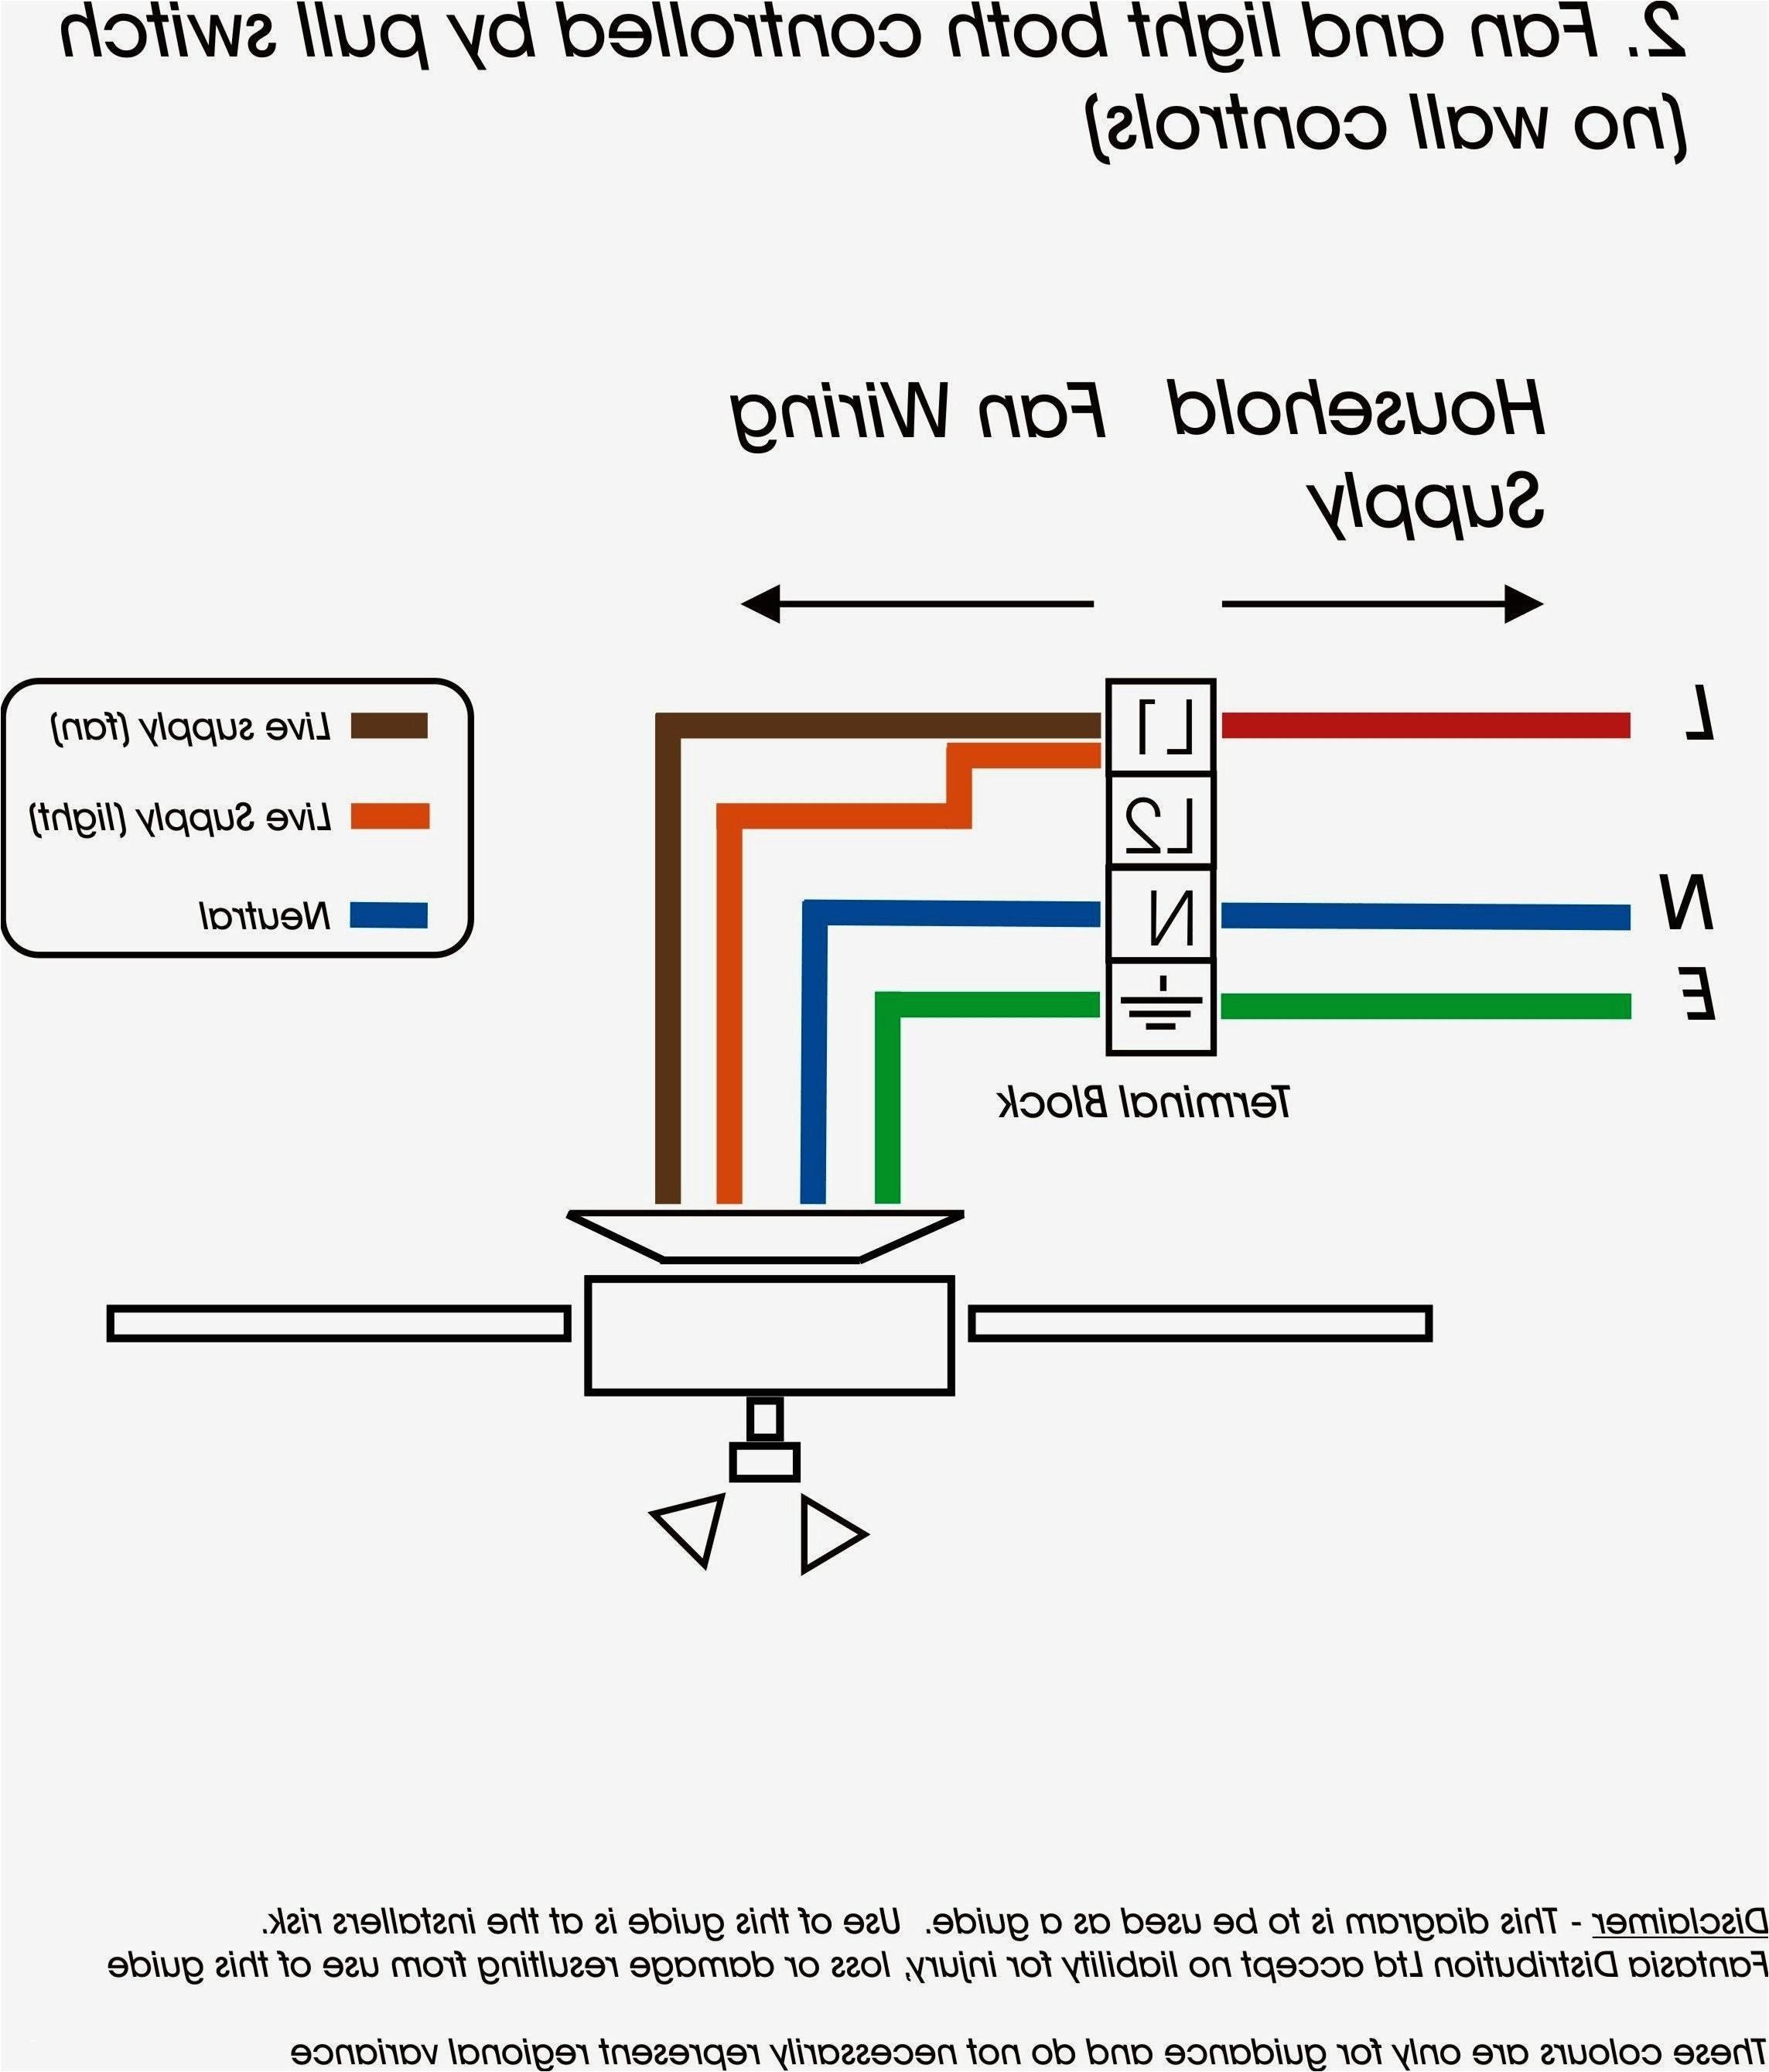 Subaru Mcintosh Wiring Diagram Entrance From 3 Wires Diagram Electrical Schematic Wiring Diagram